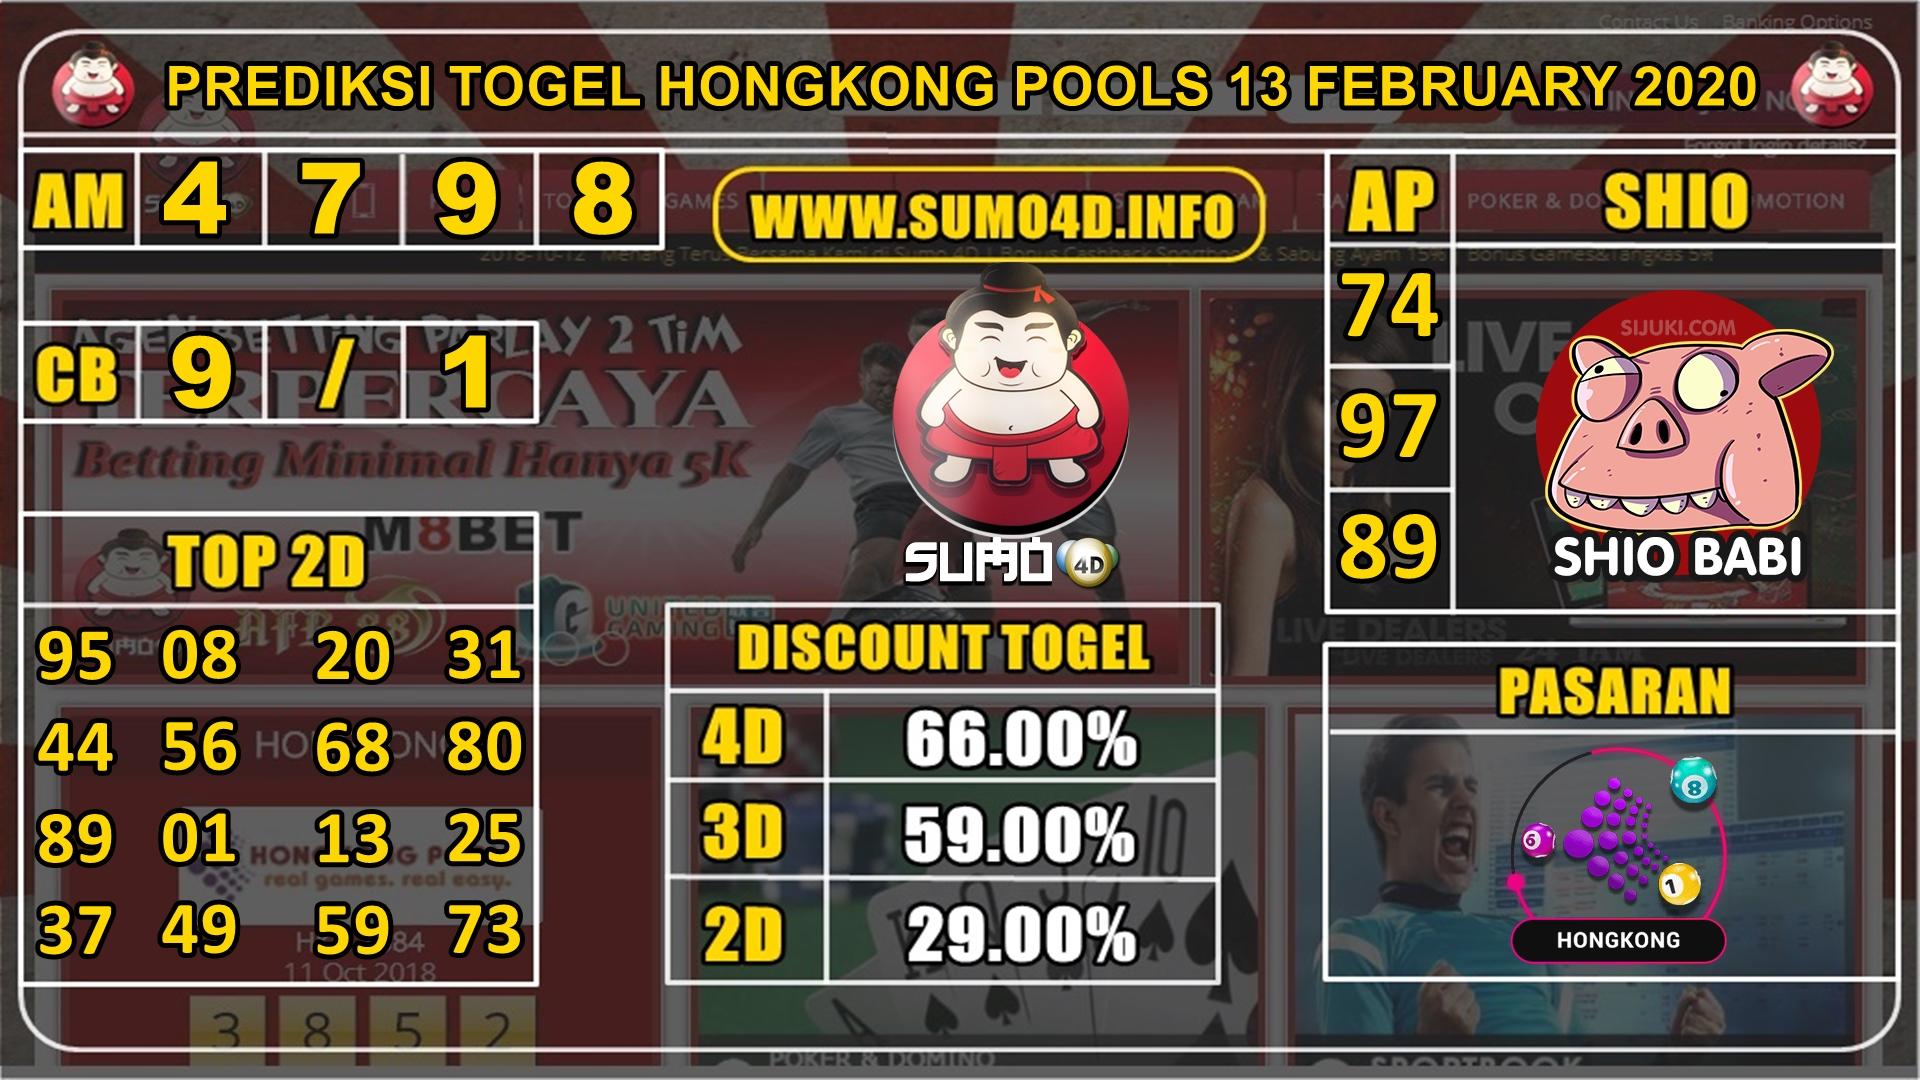 PREDIKSI TOGEL HONGKONG POOLS 13 FEBRUARY 2020